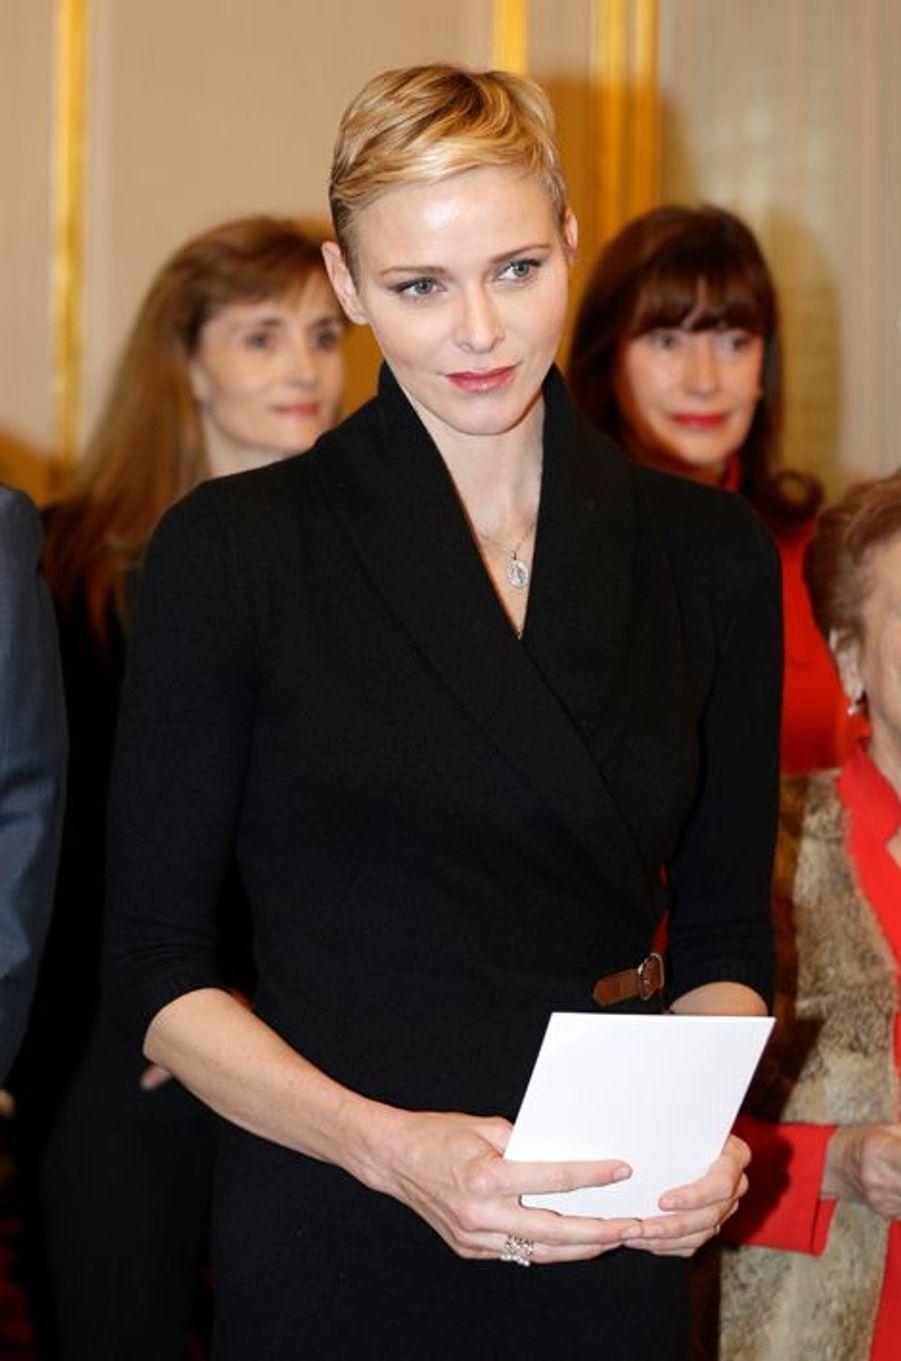 La princesse Charlène de Monaco à Monaco, le 17 novembre 2015